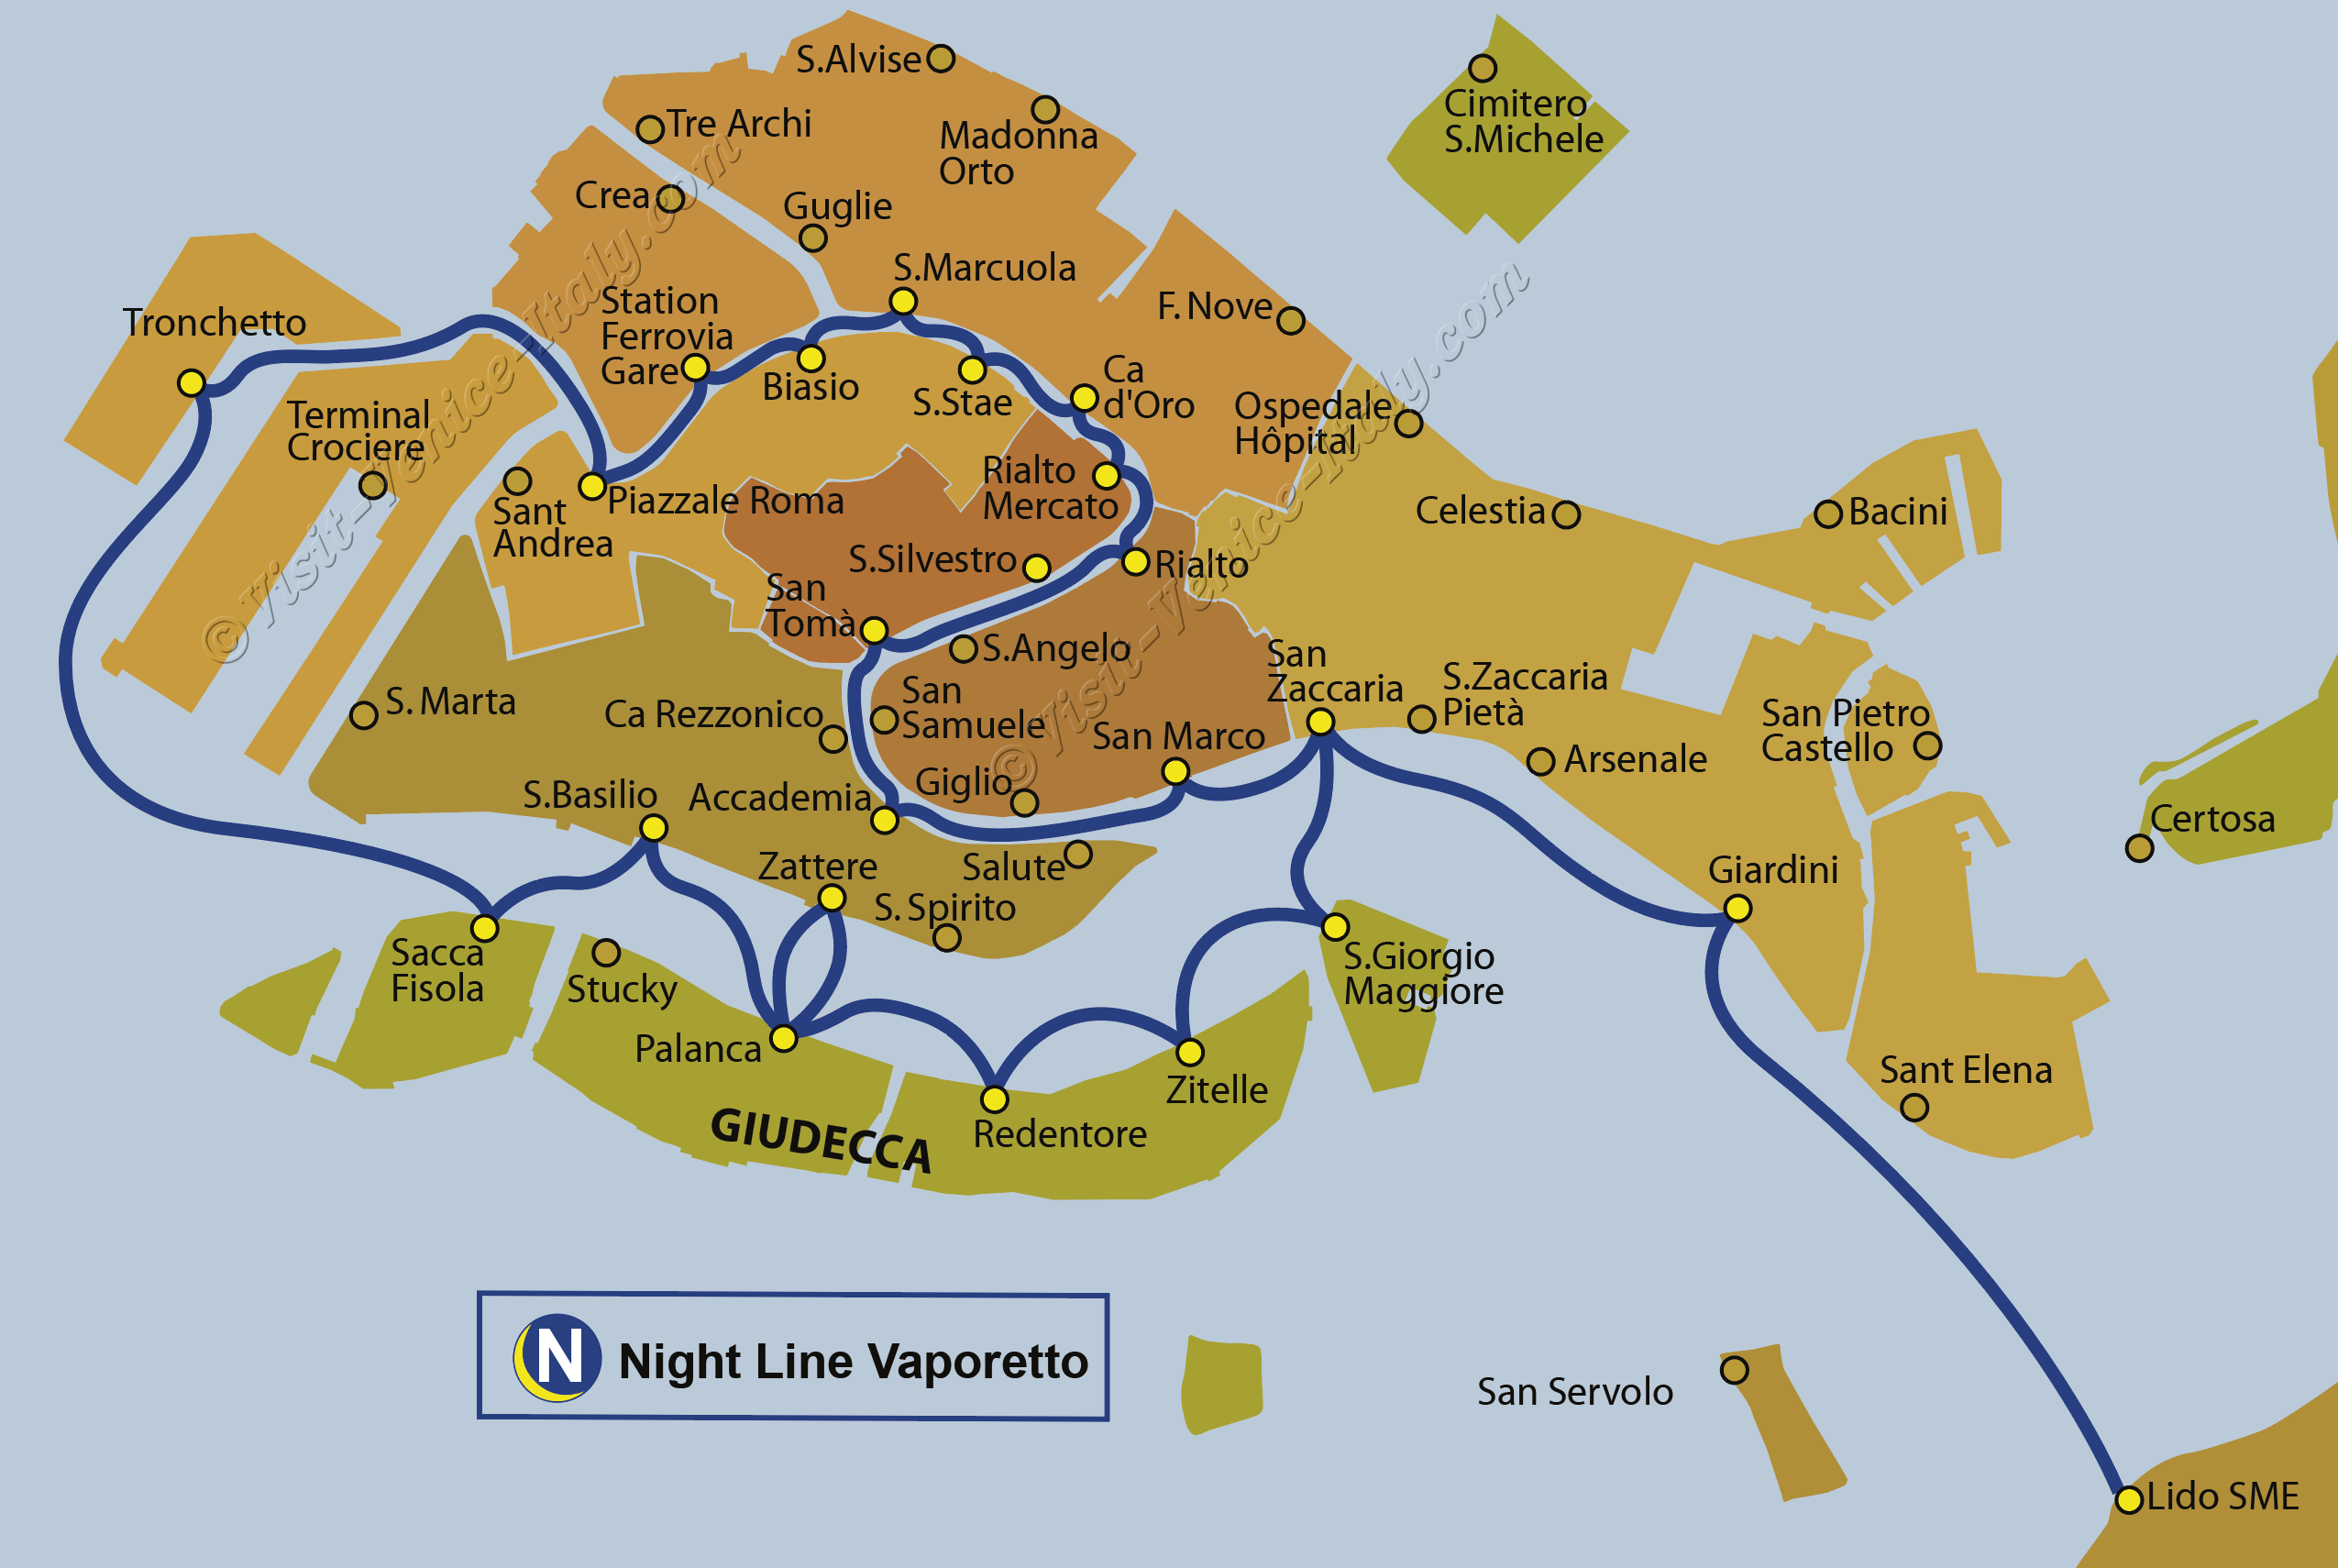 Cartina Vaporetti Venezia.Transport Vaporetto Waterbus Bus Lines Maps Venice Italy